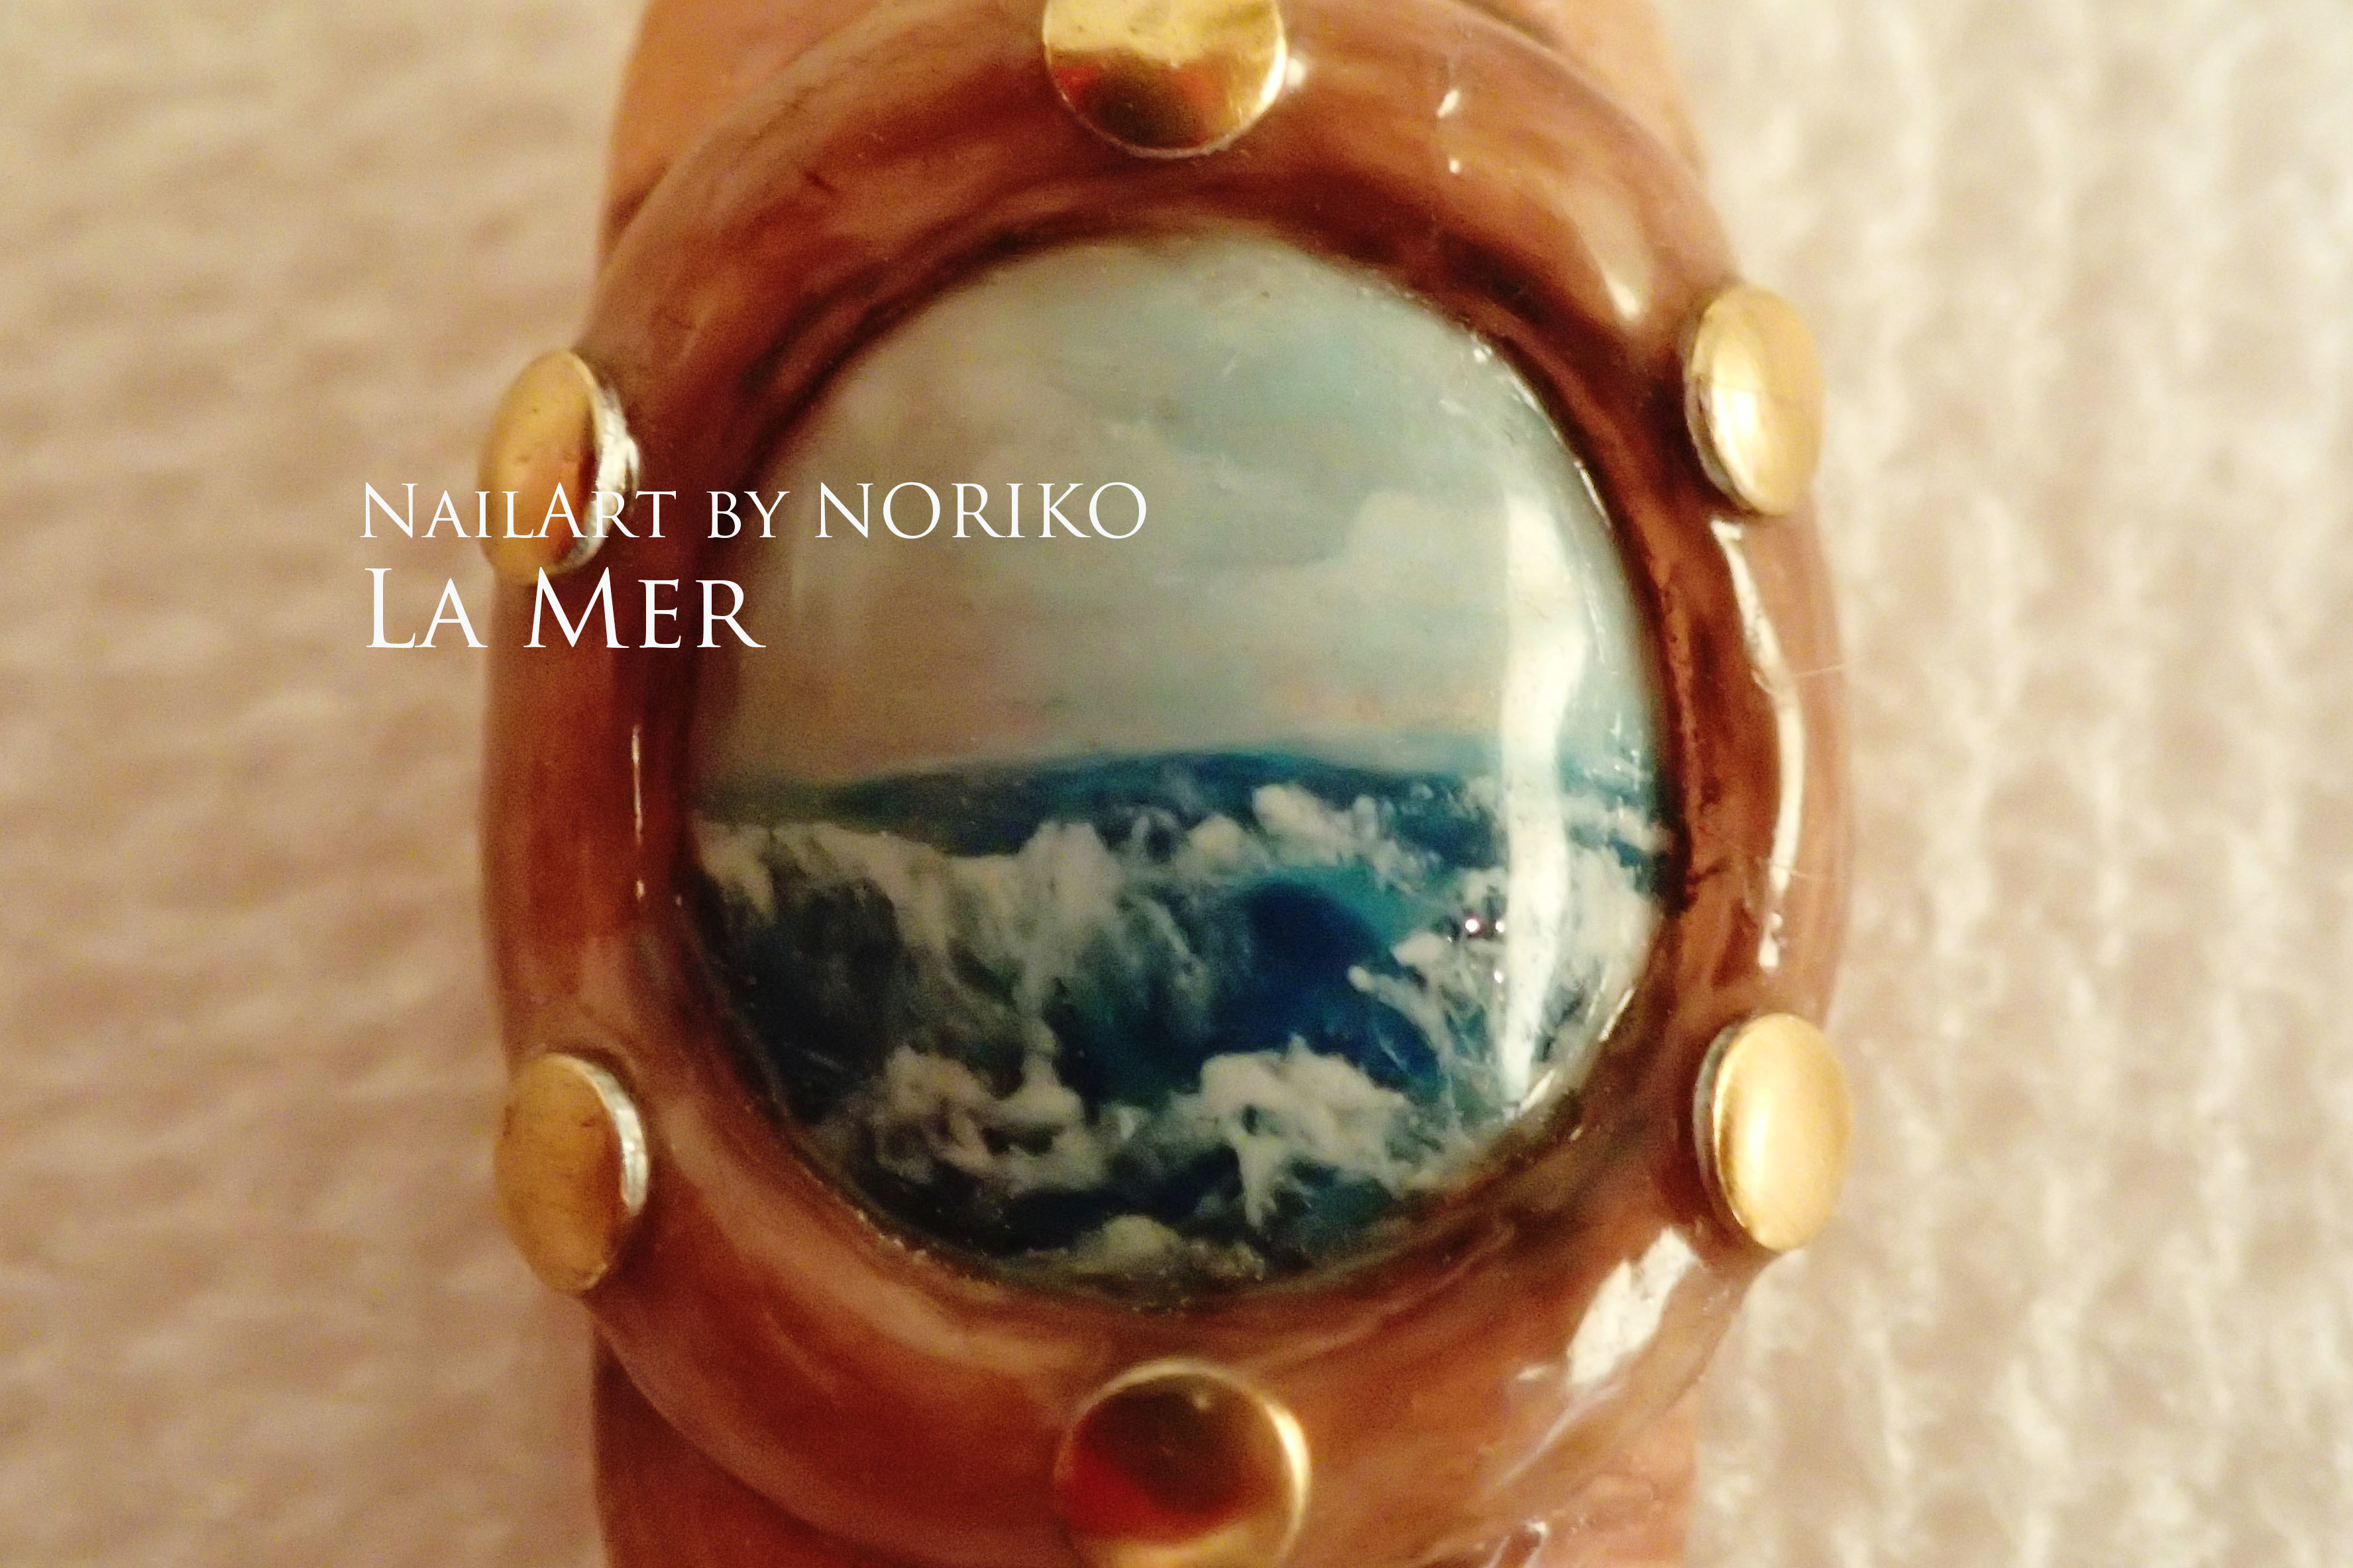 Pregel Award_7 海 第11回プリジェルアワード受賞アート Nail Artist